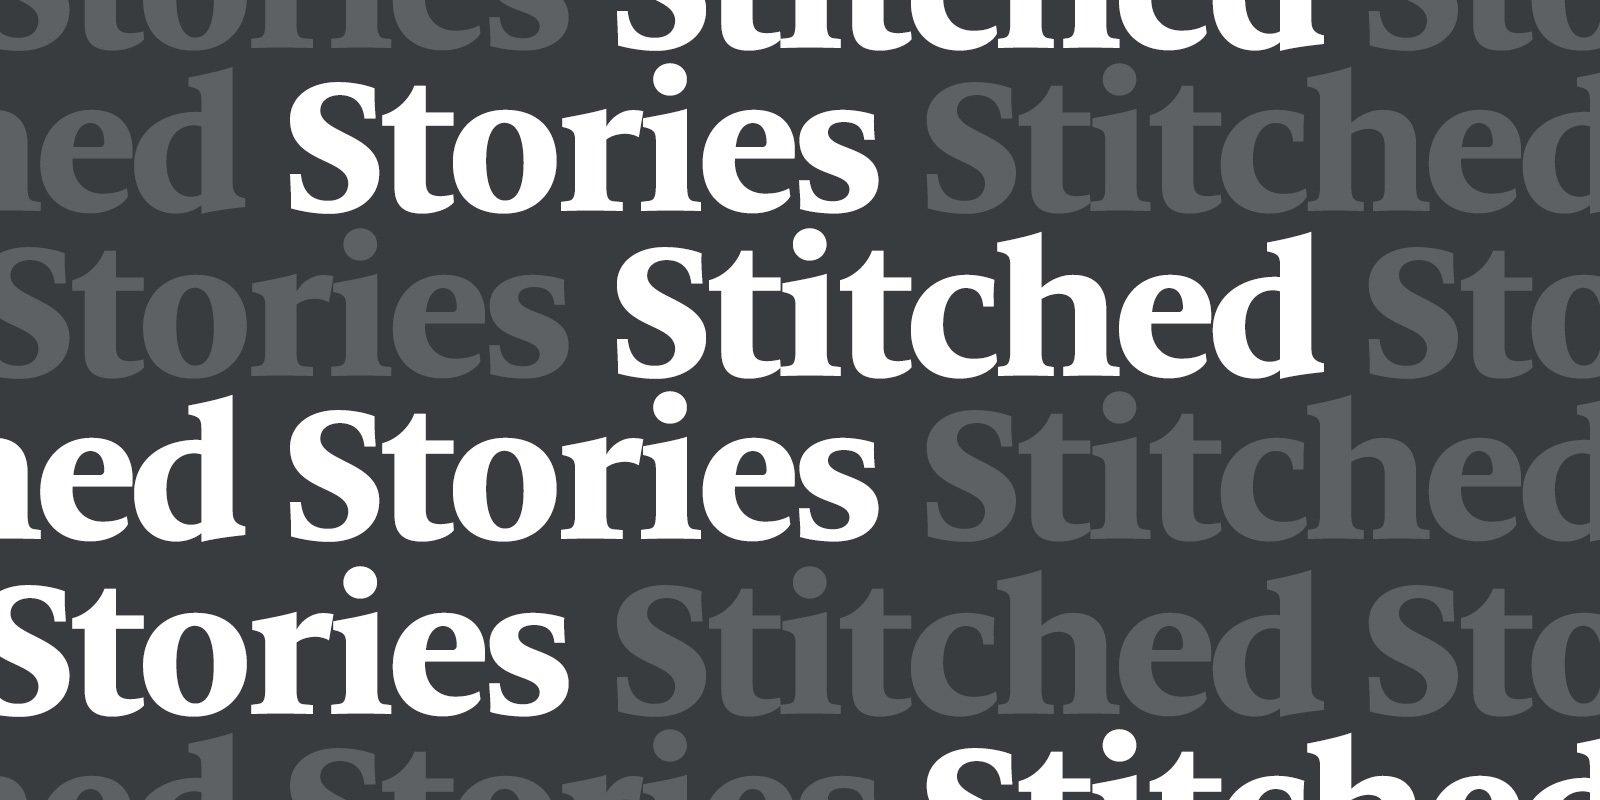 Photo 1 of 1 in Platform Update: Stitched Stories